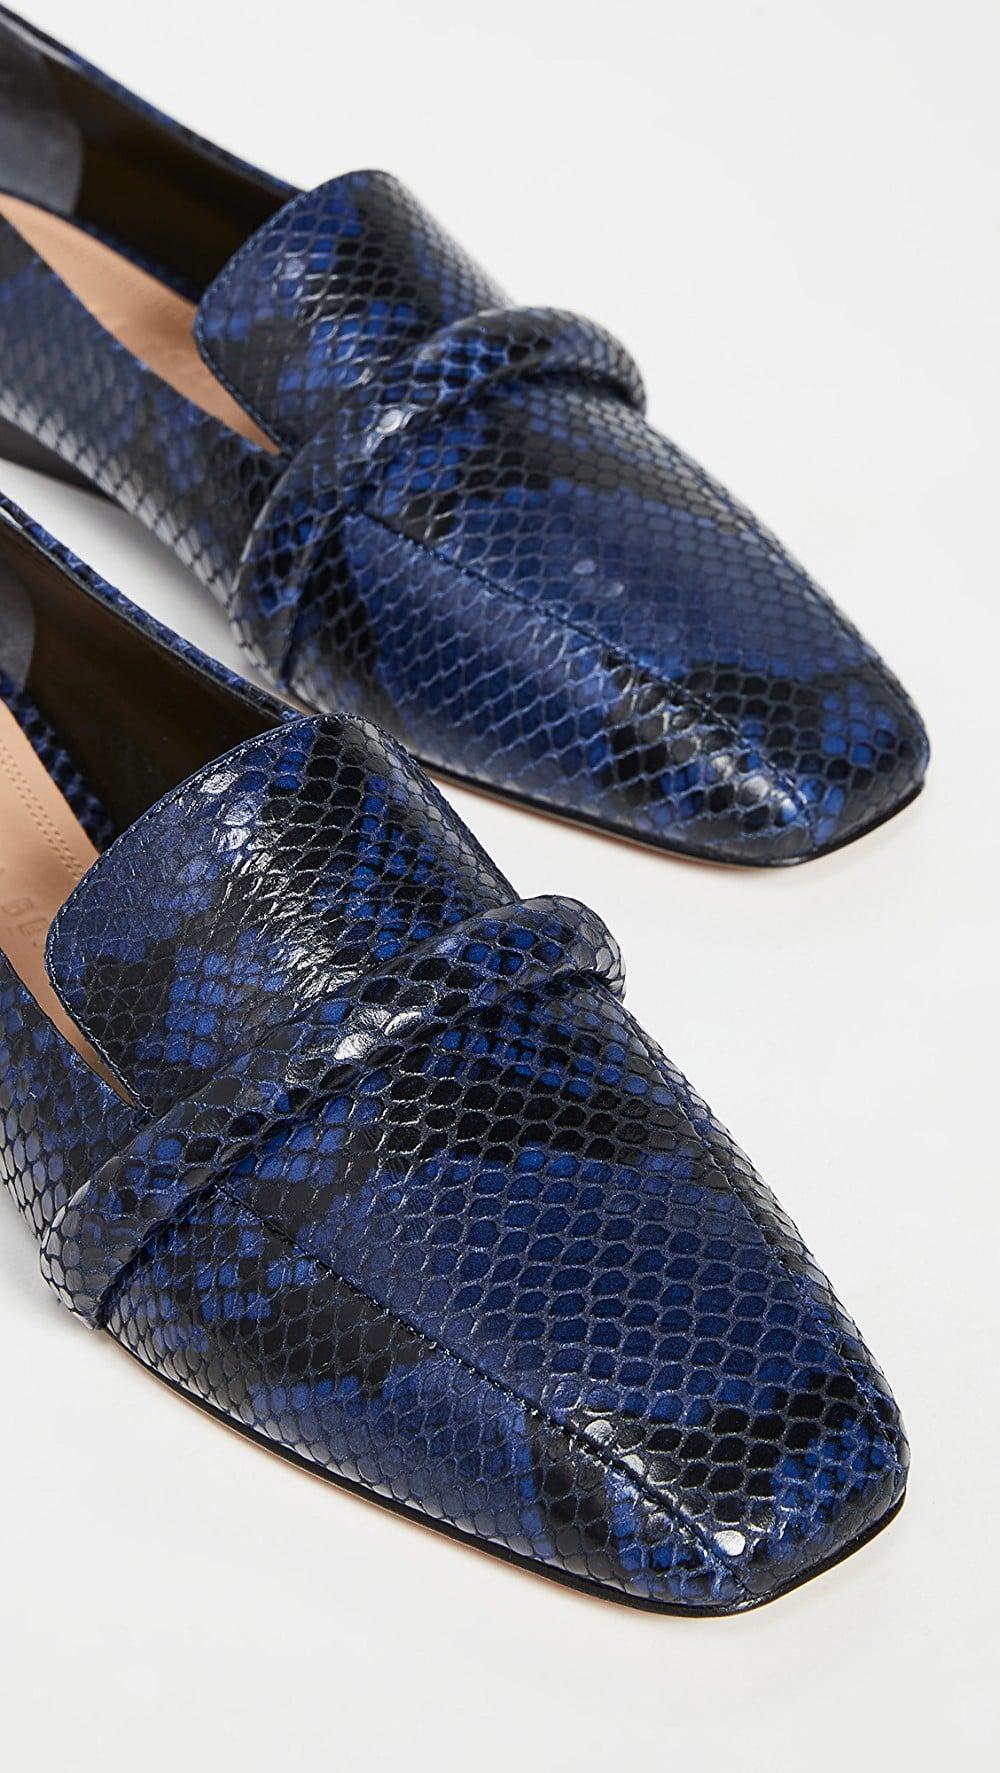 Best Loafers For Women 2020 | POPSUGAR